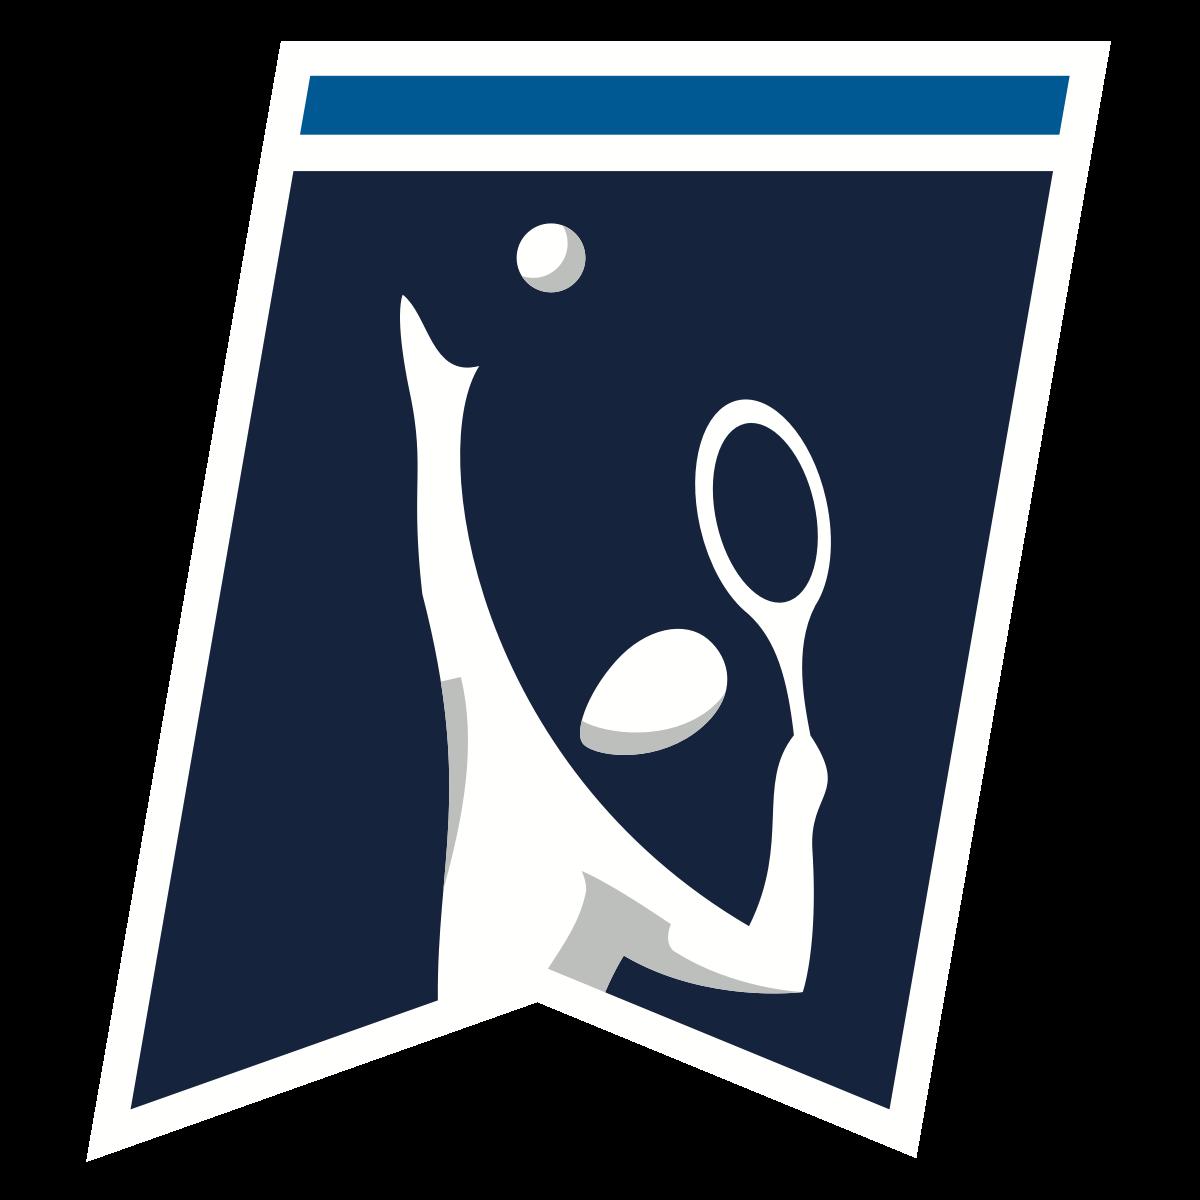 2018 DII Men's Tennis Championship